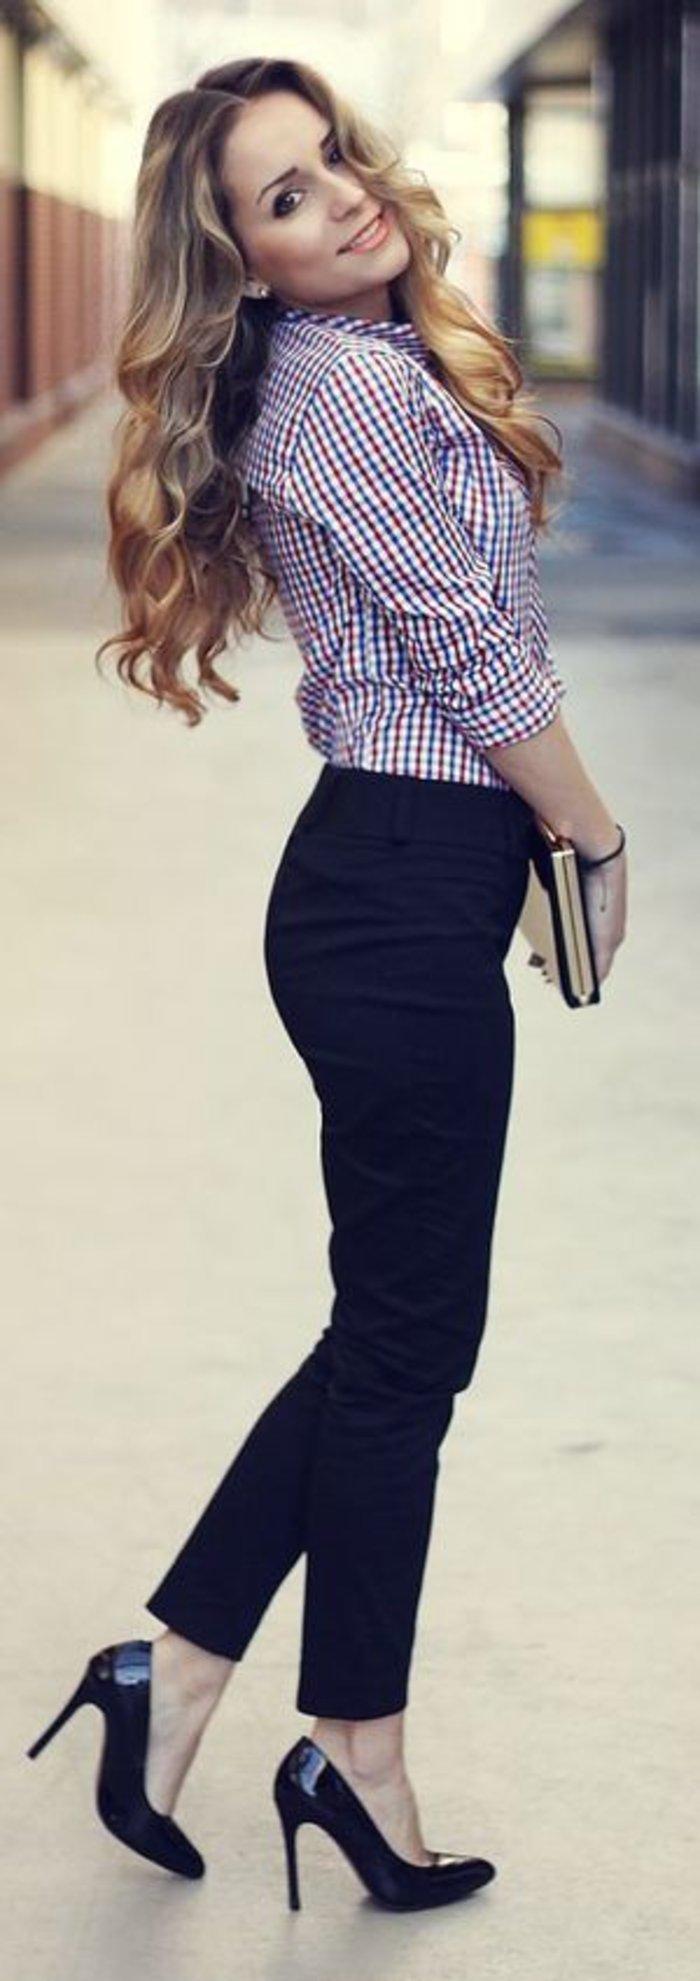 Business look! Ψηλόμεσο παντελόνι και μεσάτο πουκάμισο, συνδυασμένα με ψηλές γόβες.